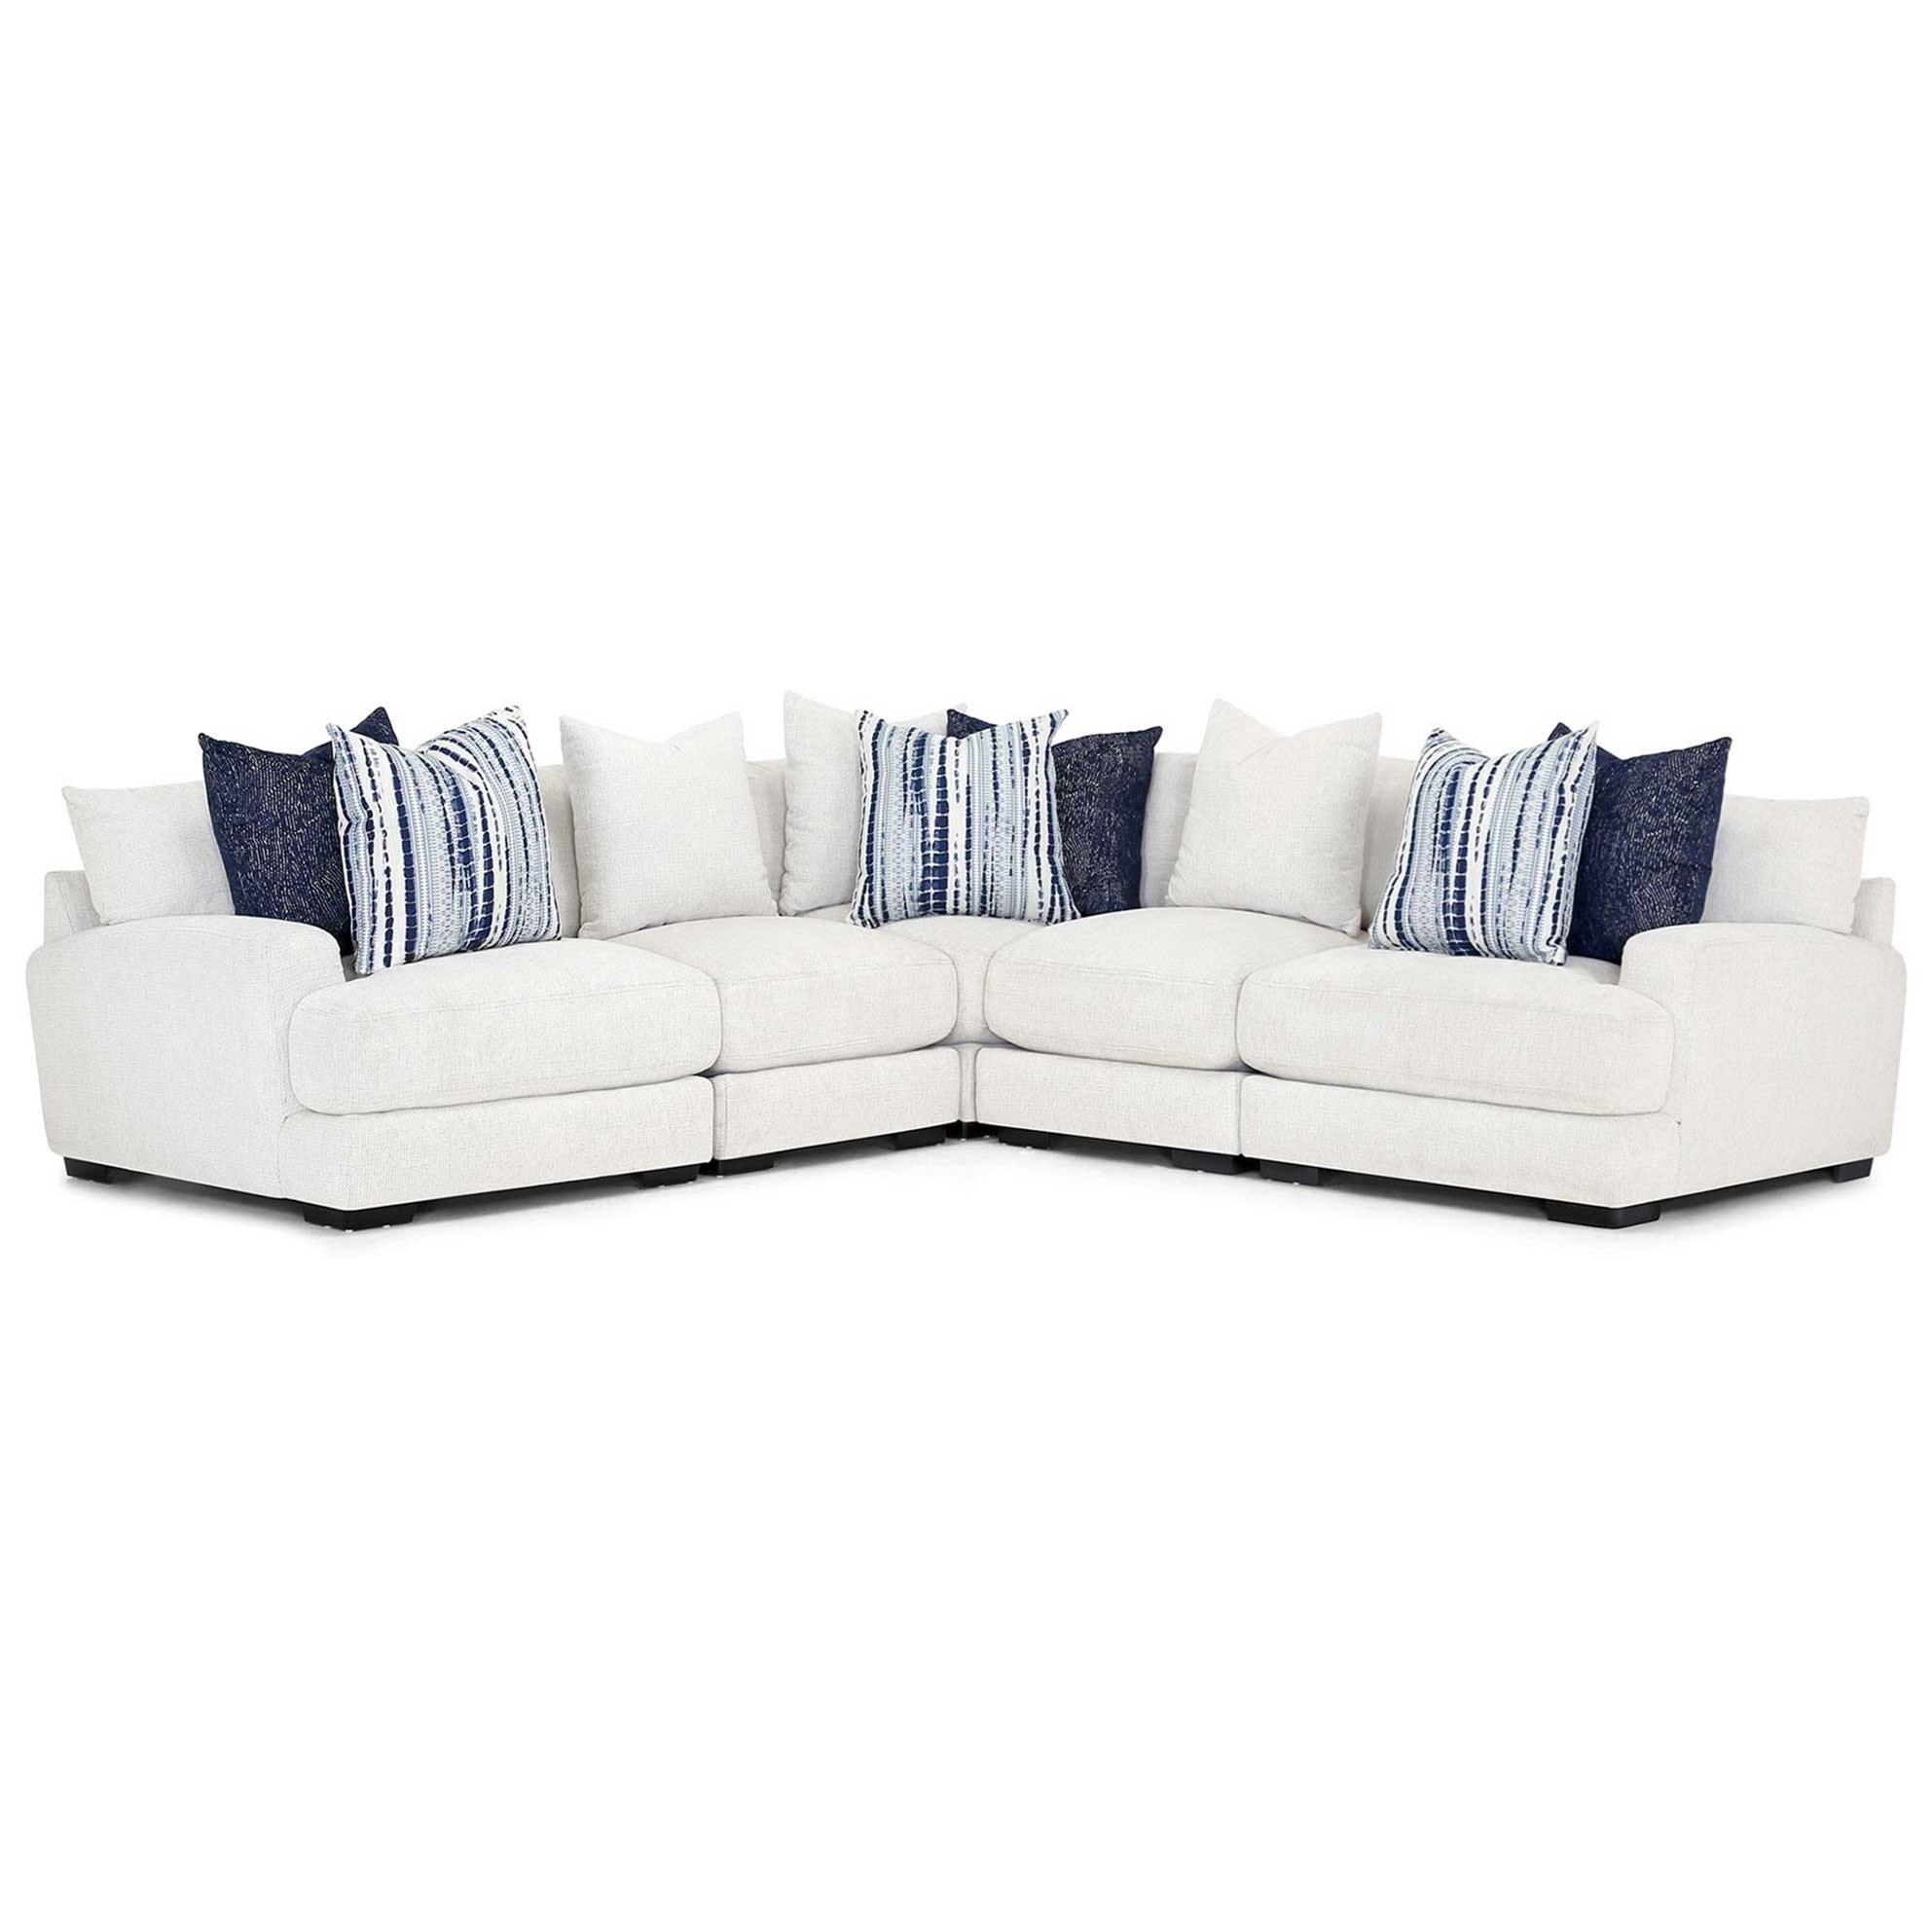 Hartman Hartman Sectional Sofa by Franklin at Morris Home